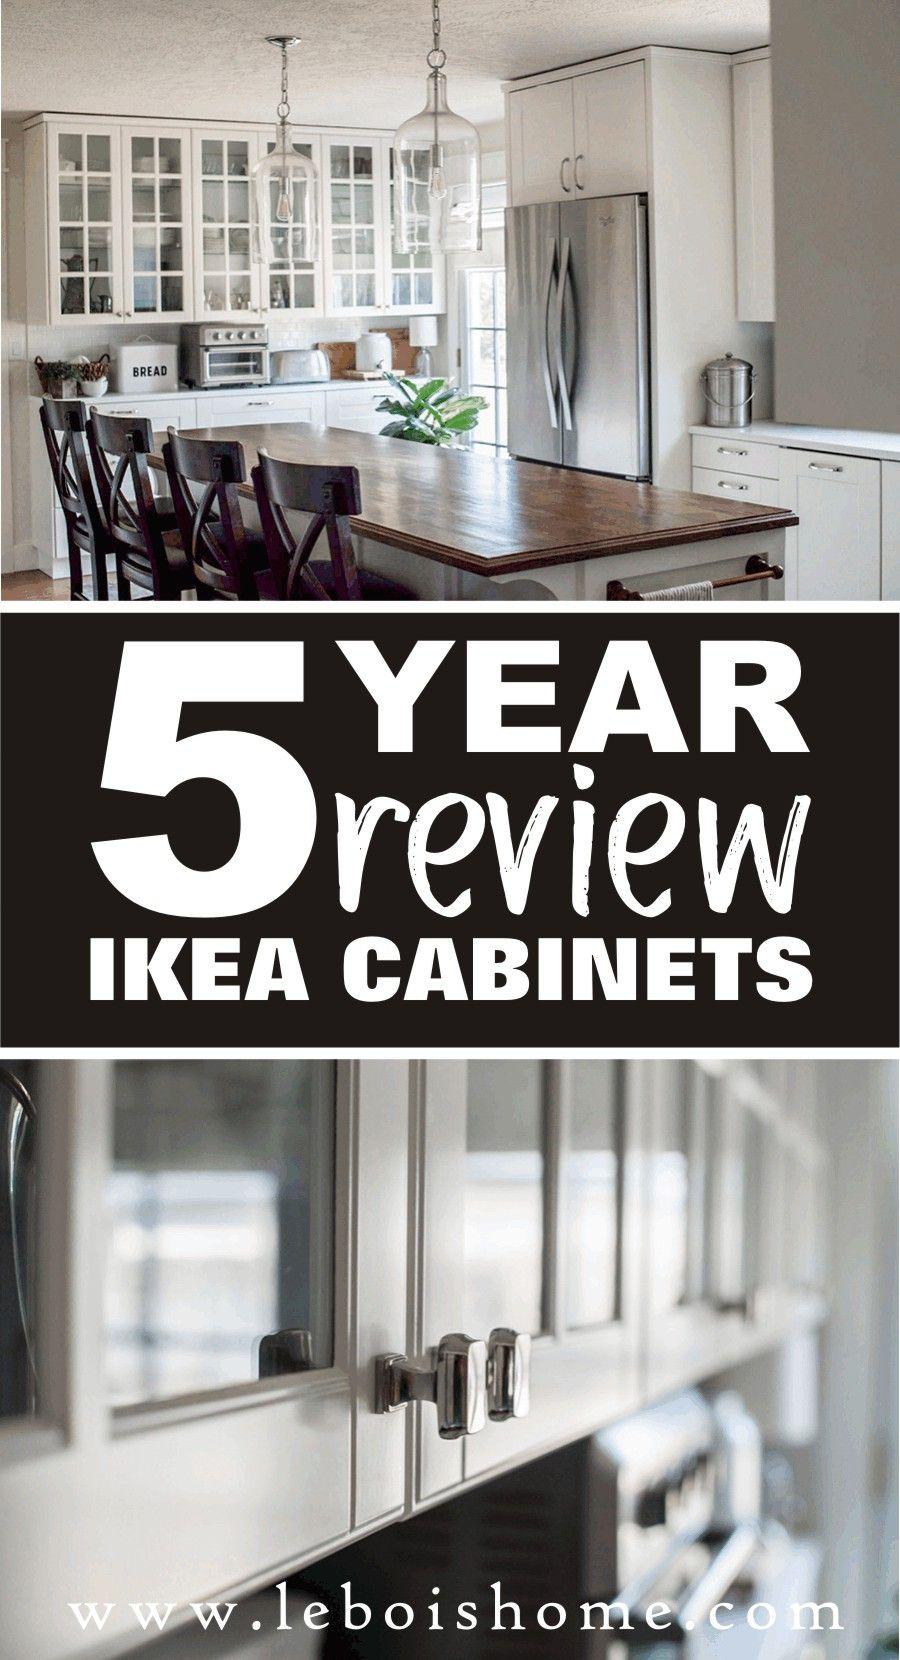 Ikea Kitchen Cabinet Review Ikea Cabinets Ikea Cabinets Review Ikea Kitchen Cabinets